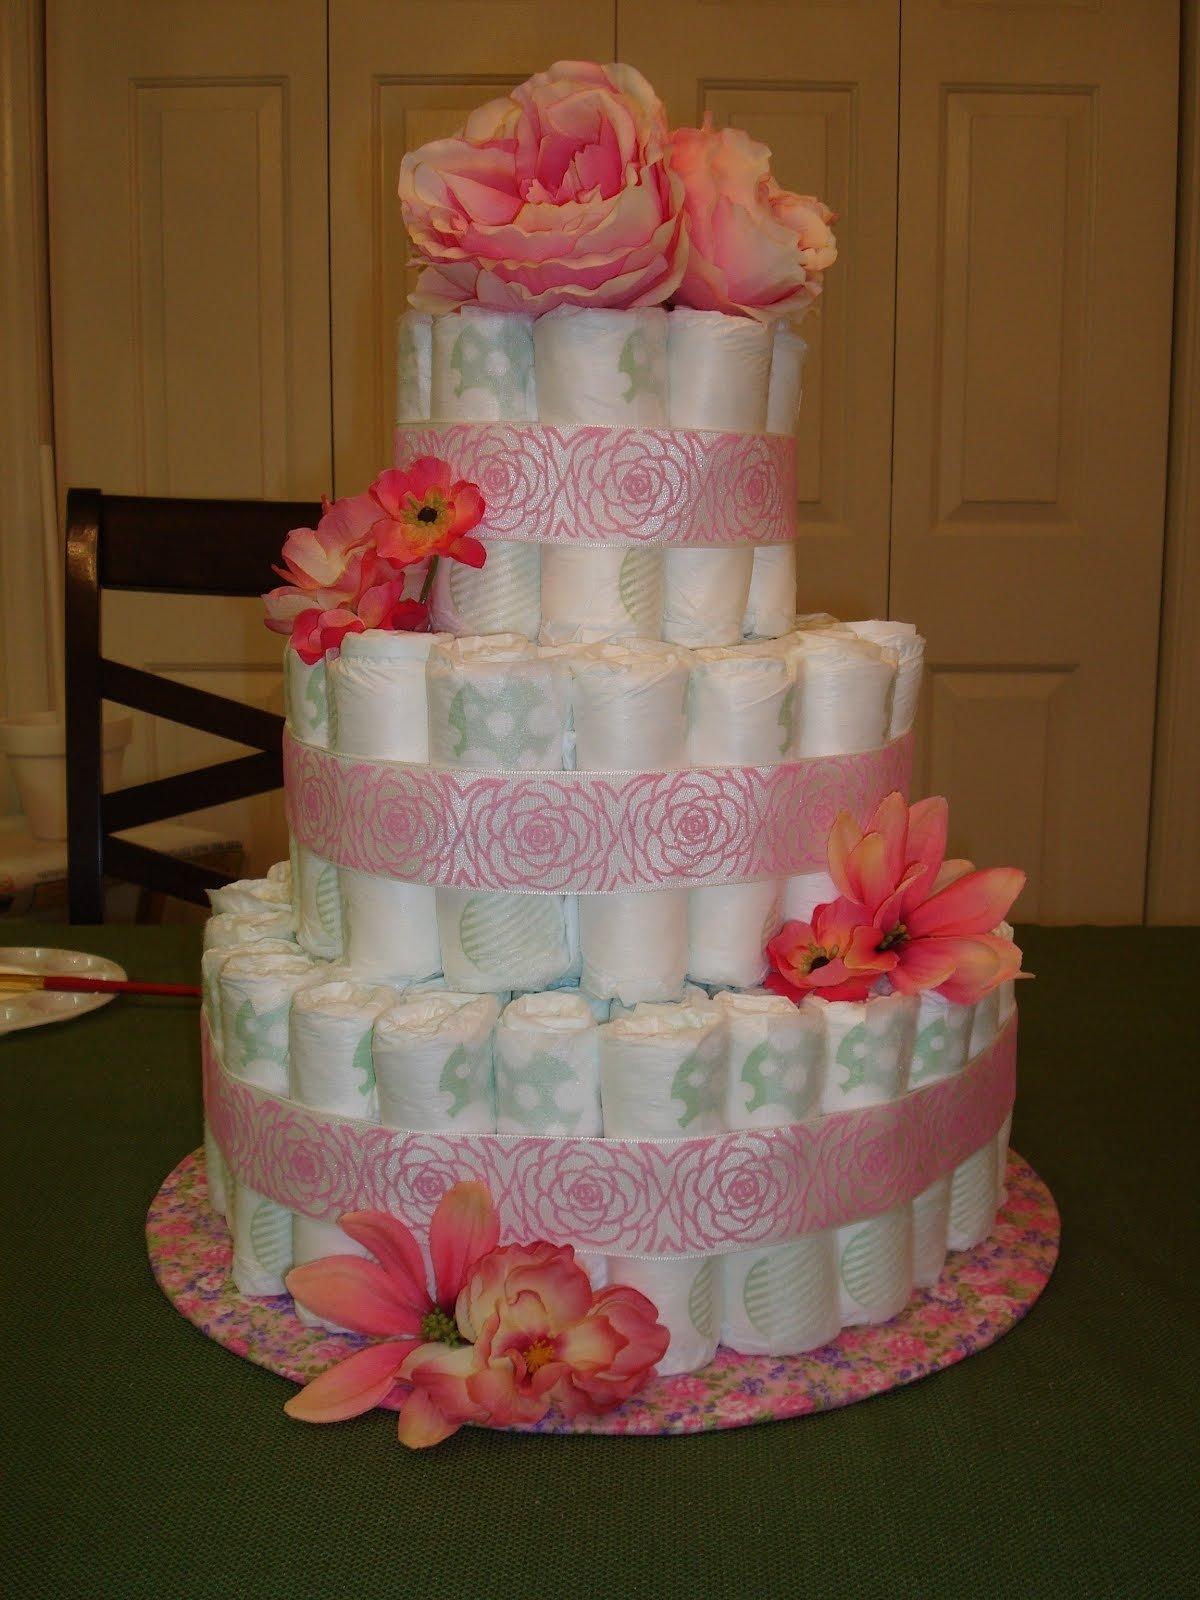 10 Fantastic Diaper Cake Ideas For Girls photo baby shower diaper cake image 2020